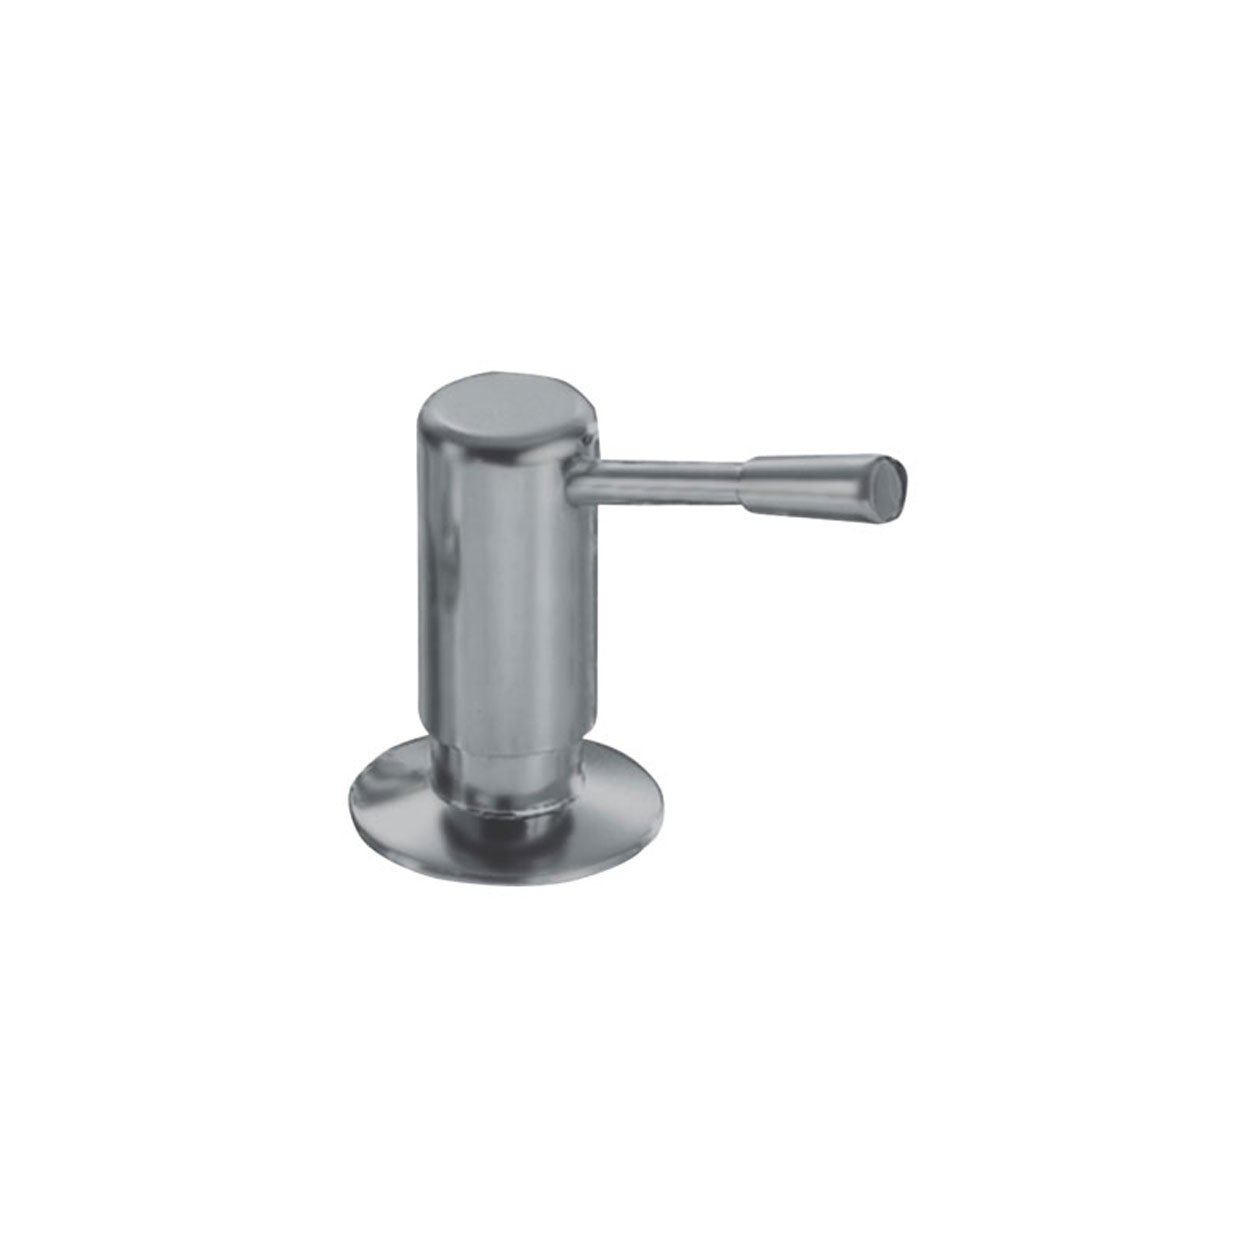 Franke 902-SN Logik Counter-Sunk Kitchen Top Refill Soap Dispenser, Satin Nickel by Franke